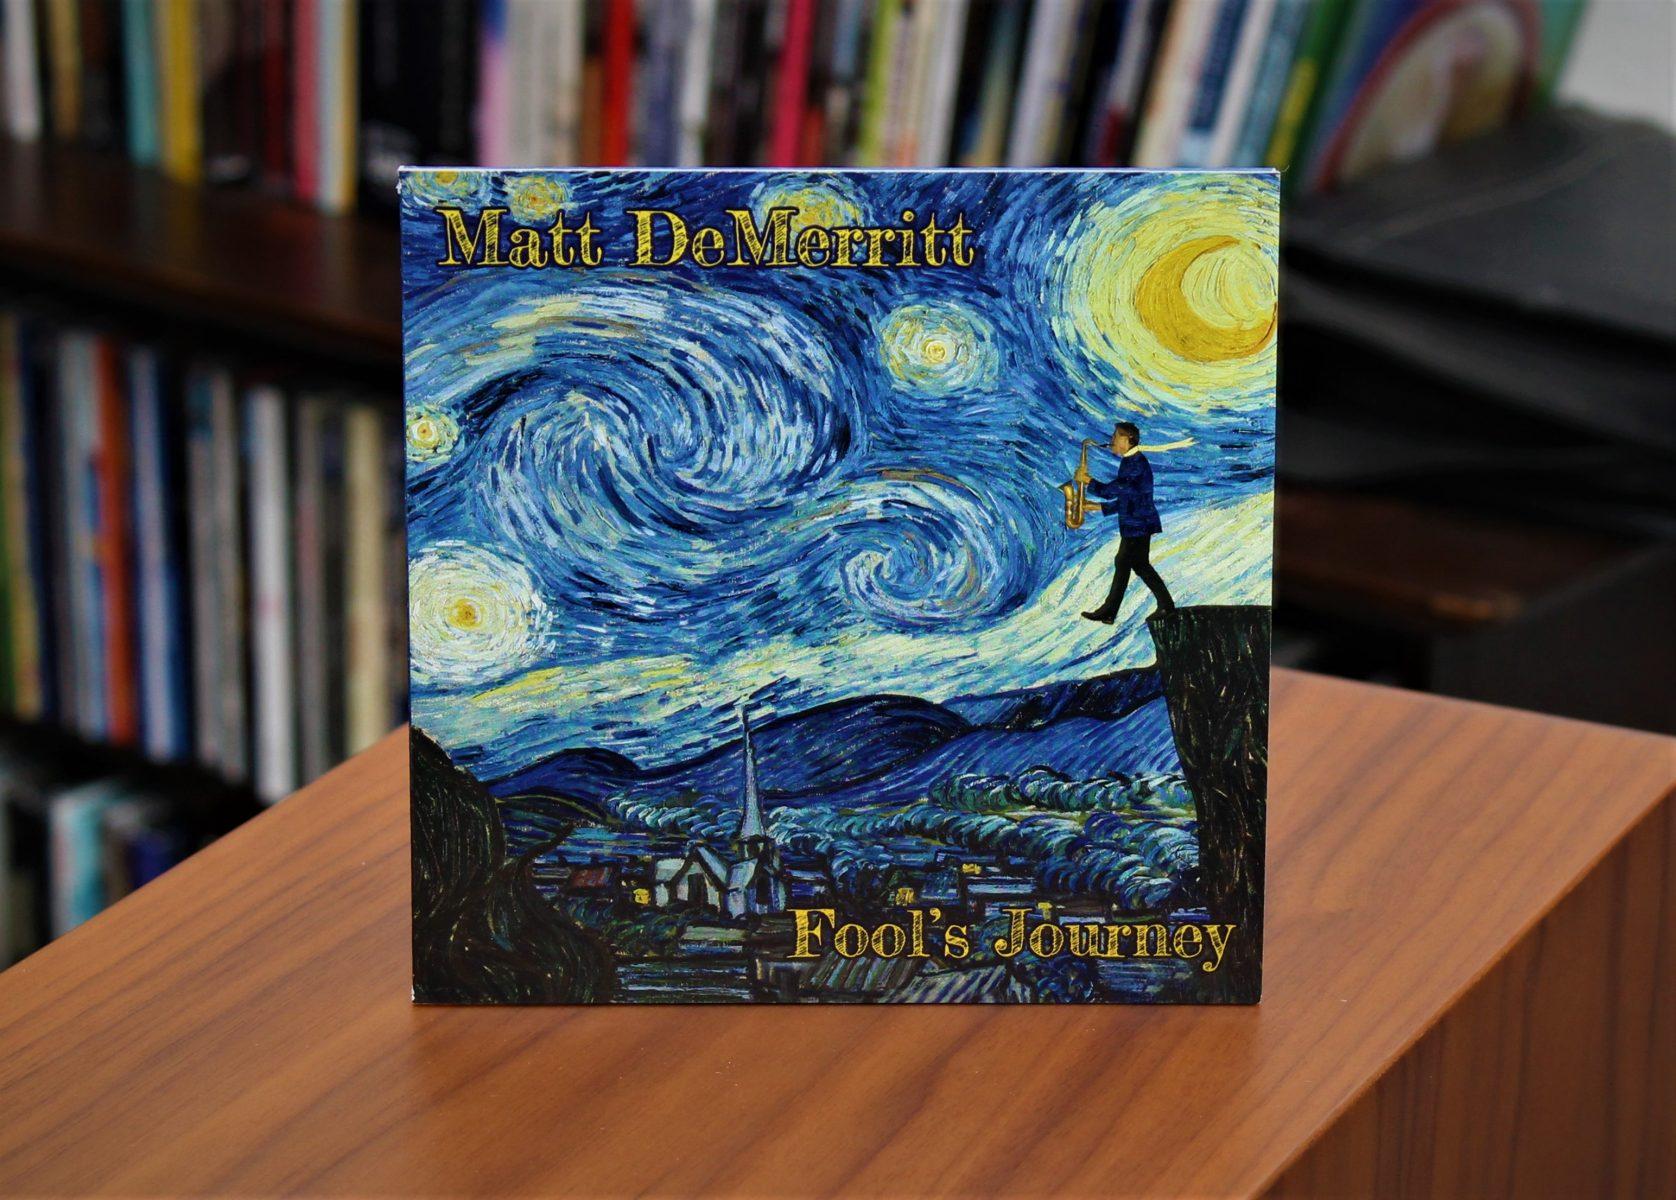 Matt DeMerritt, Fool's Journey | The Vinyl Anachronist